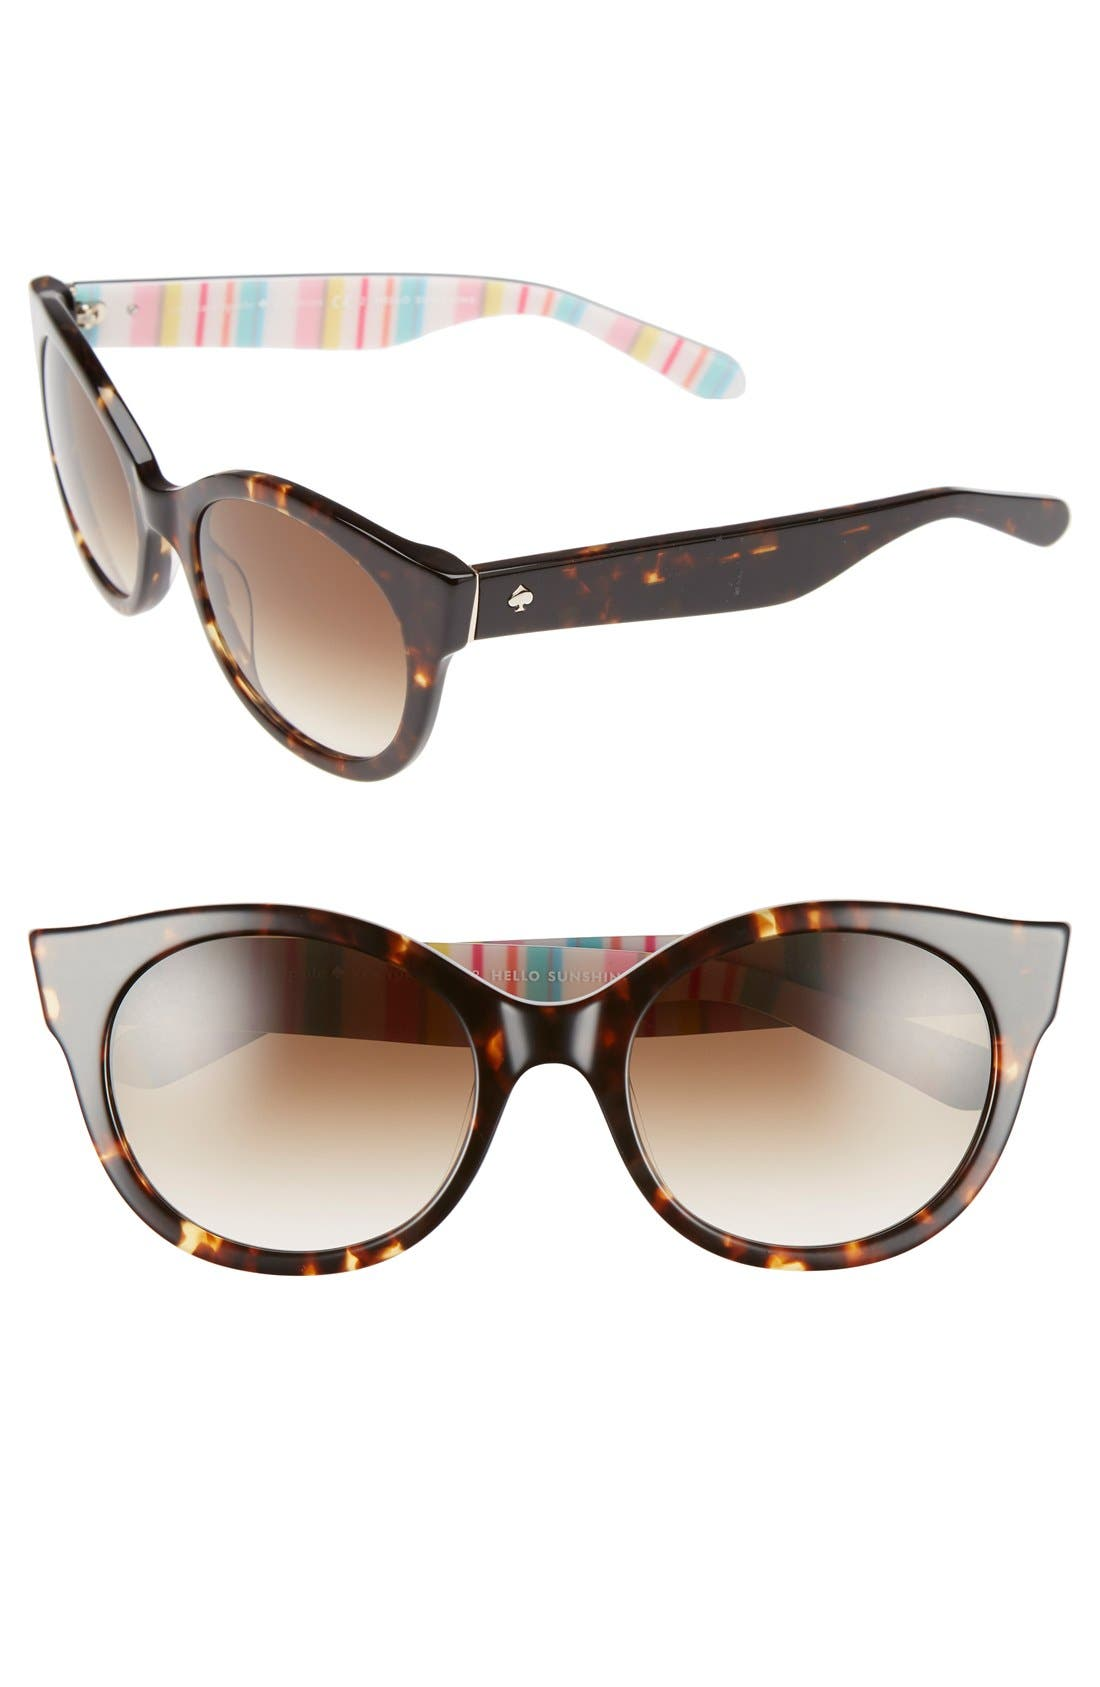 Main Image - kate spade new york 'melly' 53mm sunglasses